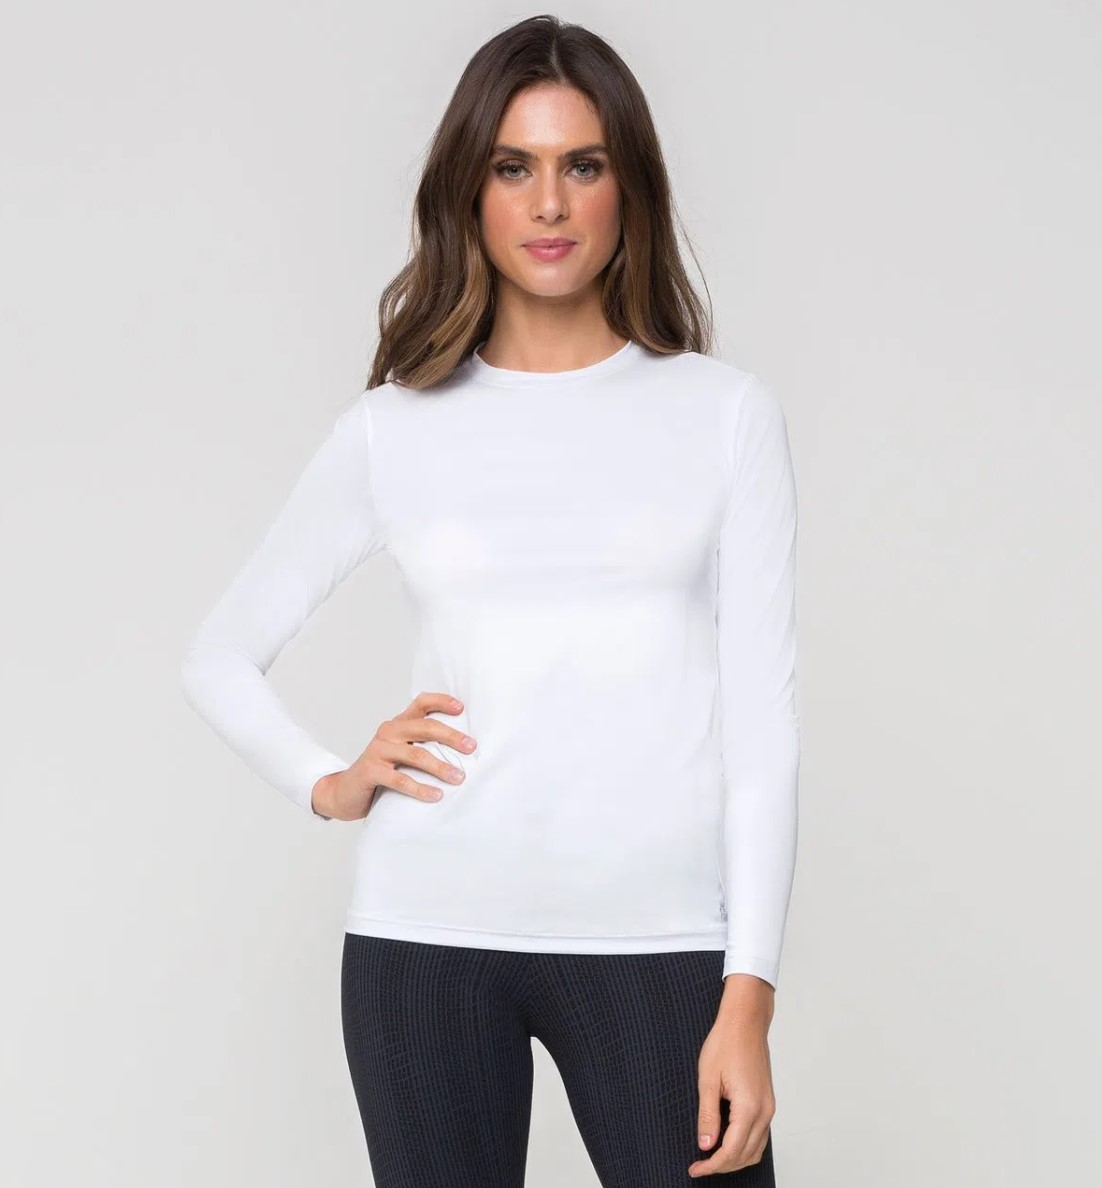 UV LINE Camiseta Uvpro Manga Longa Feminino Branco Proteção Solar